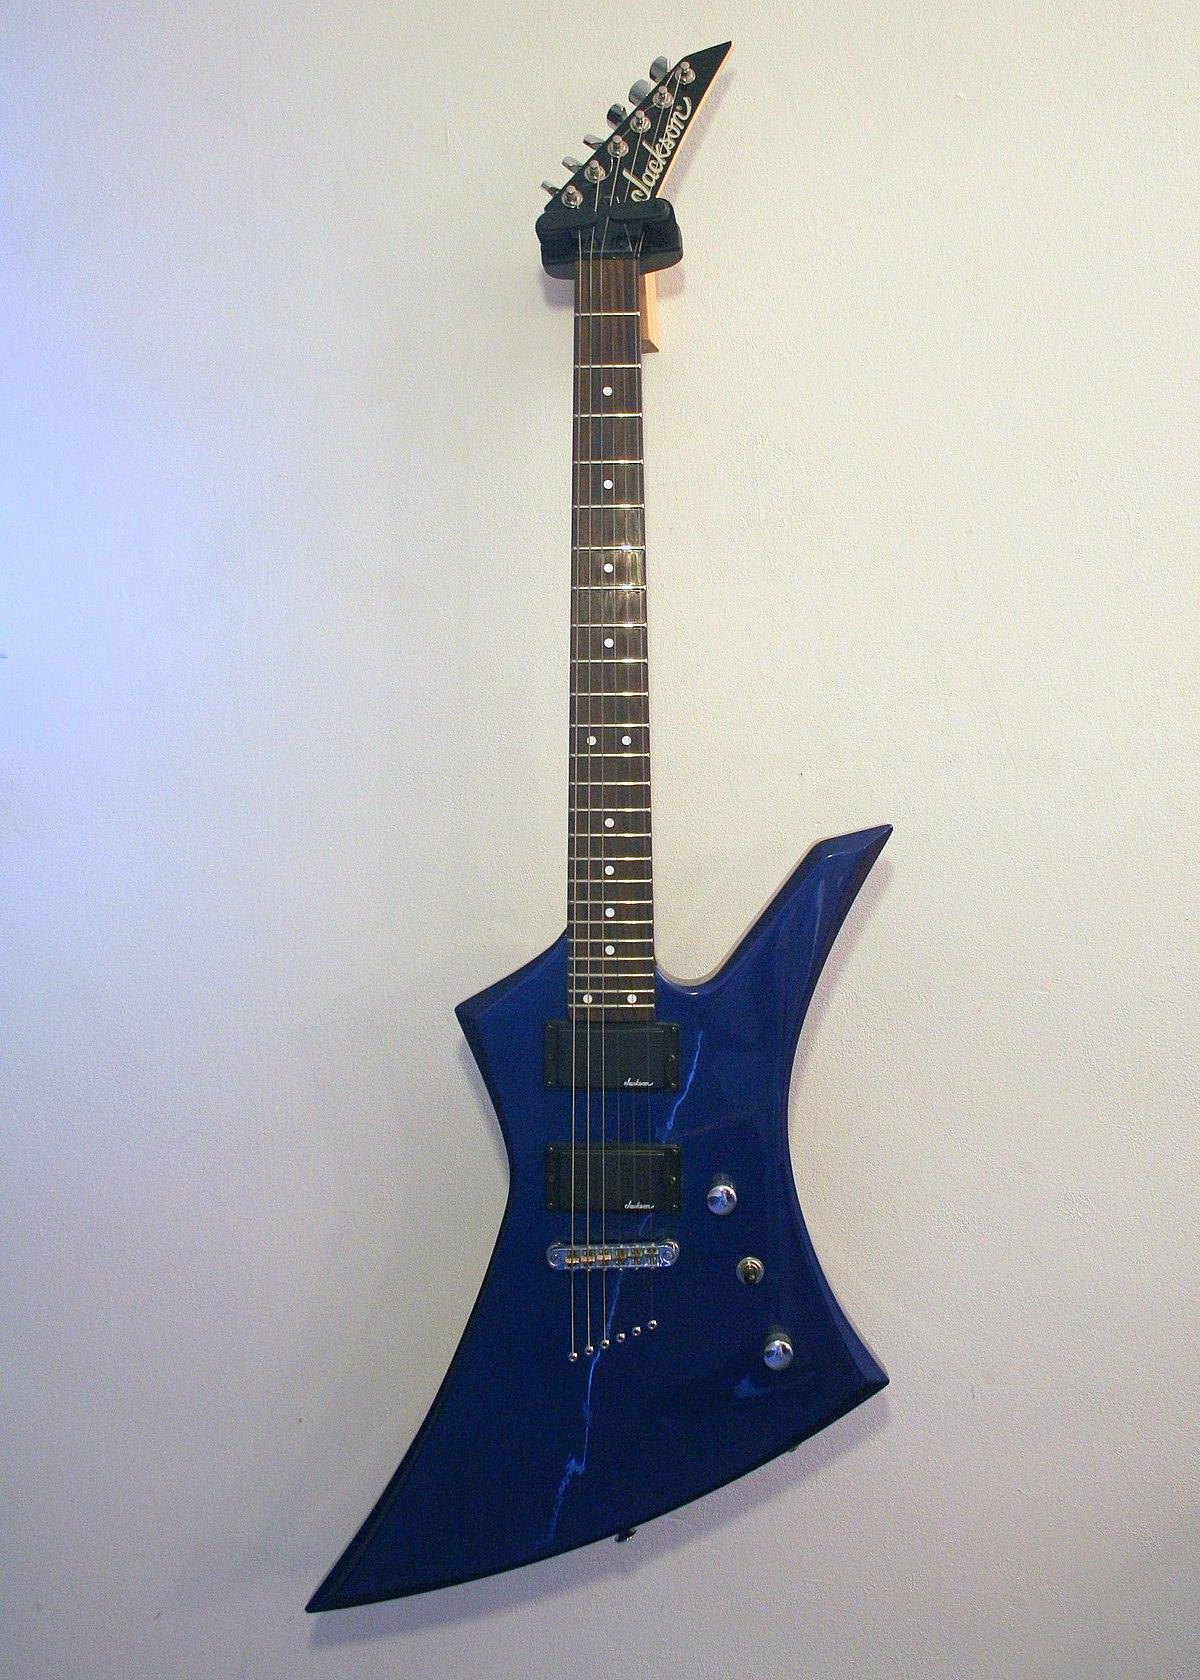 File:Jackson Kelly Guitar.JPG - Wikipedia